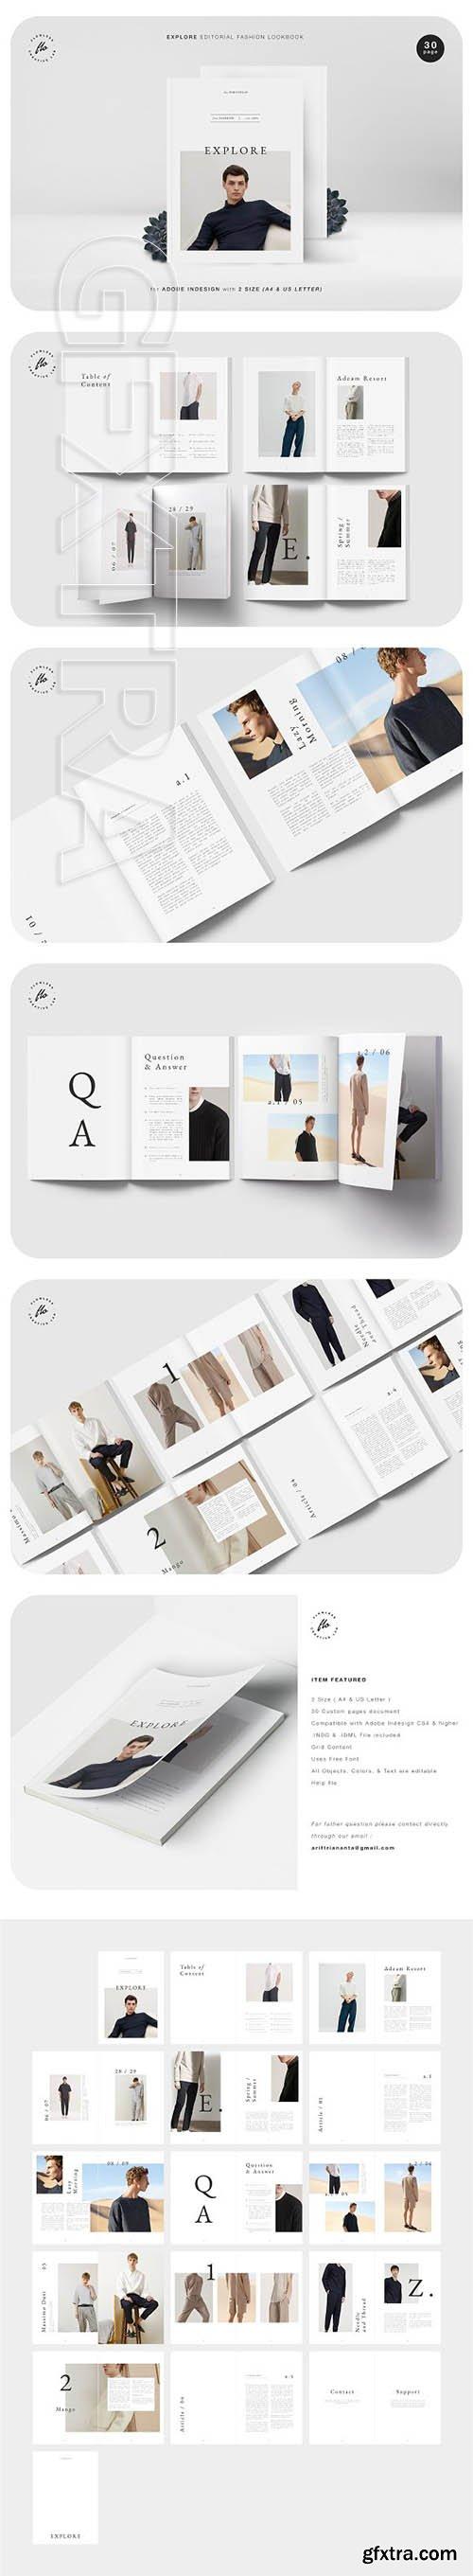 CreativeMarket - EXPLORE Editorial Fashion Lookbook 3479585